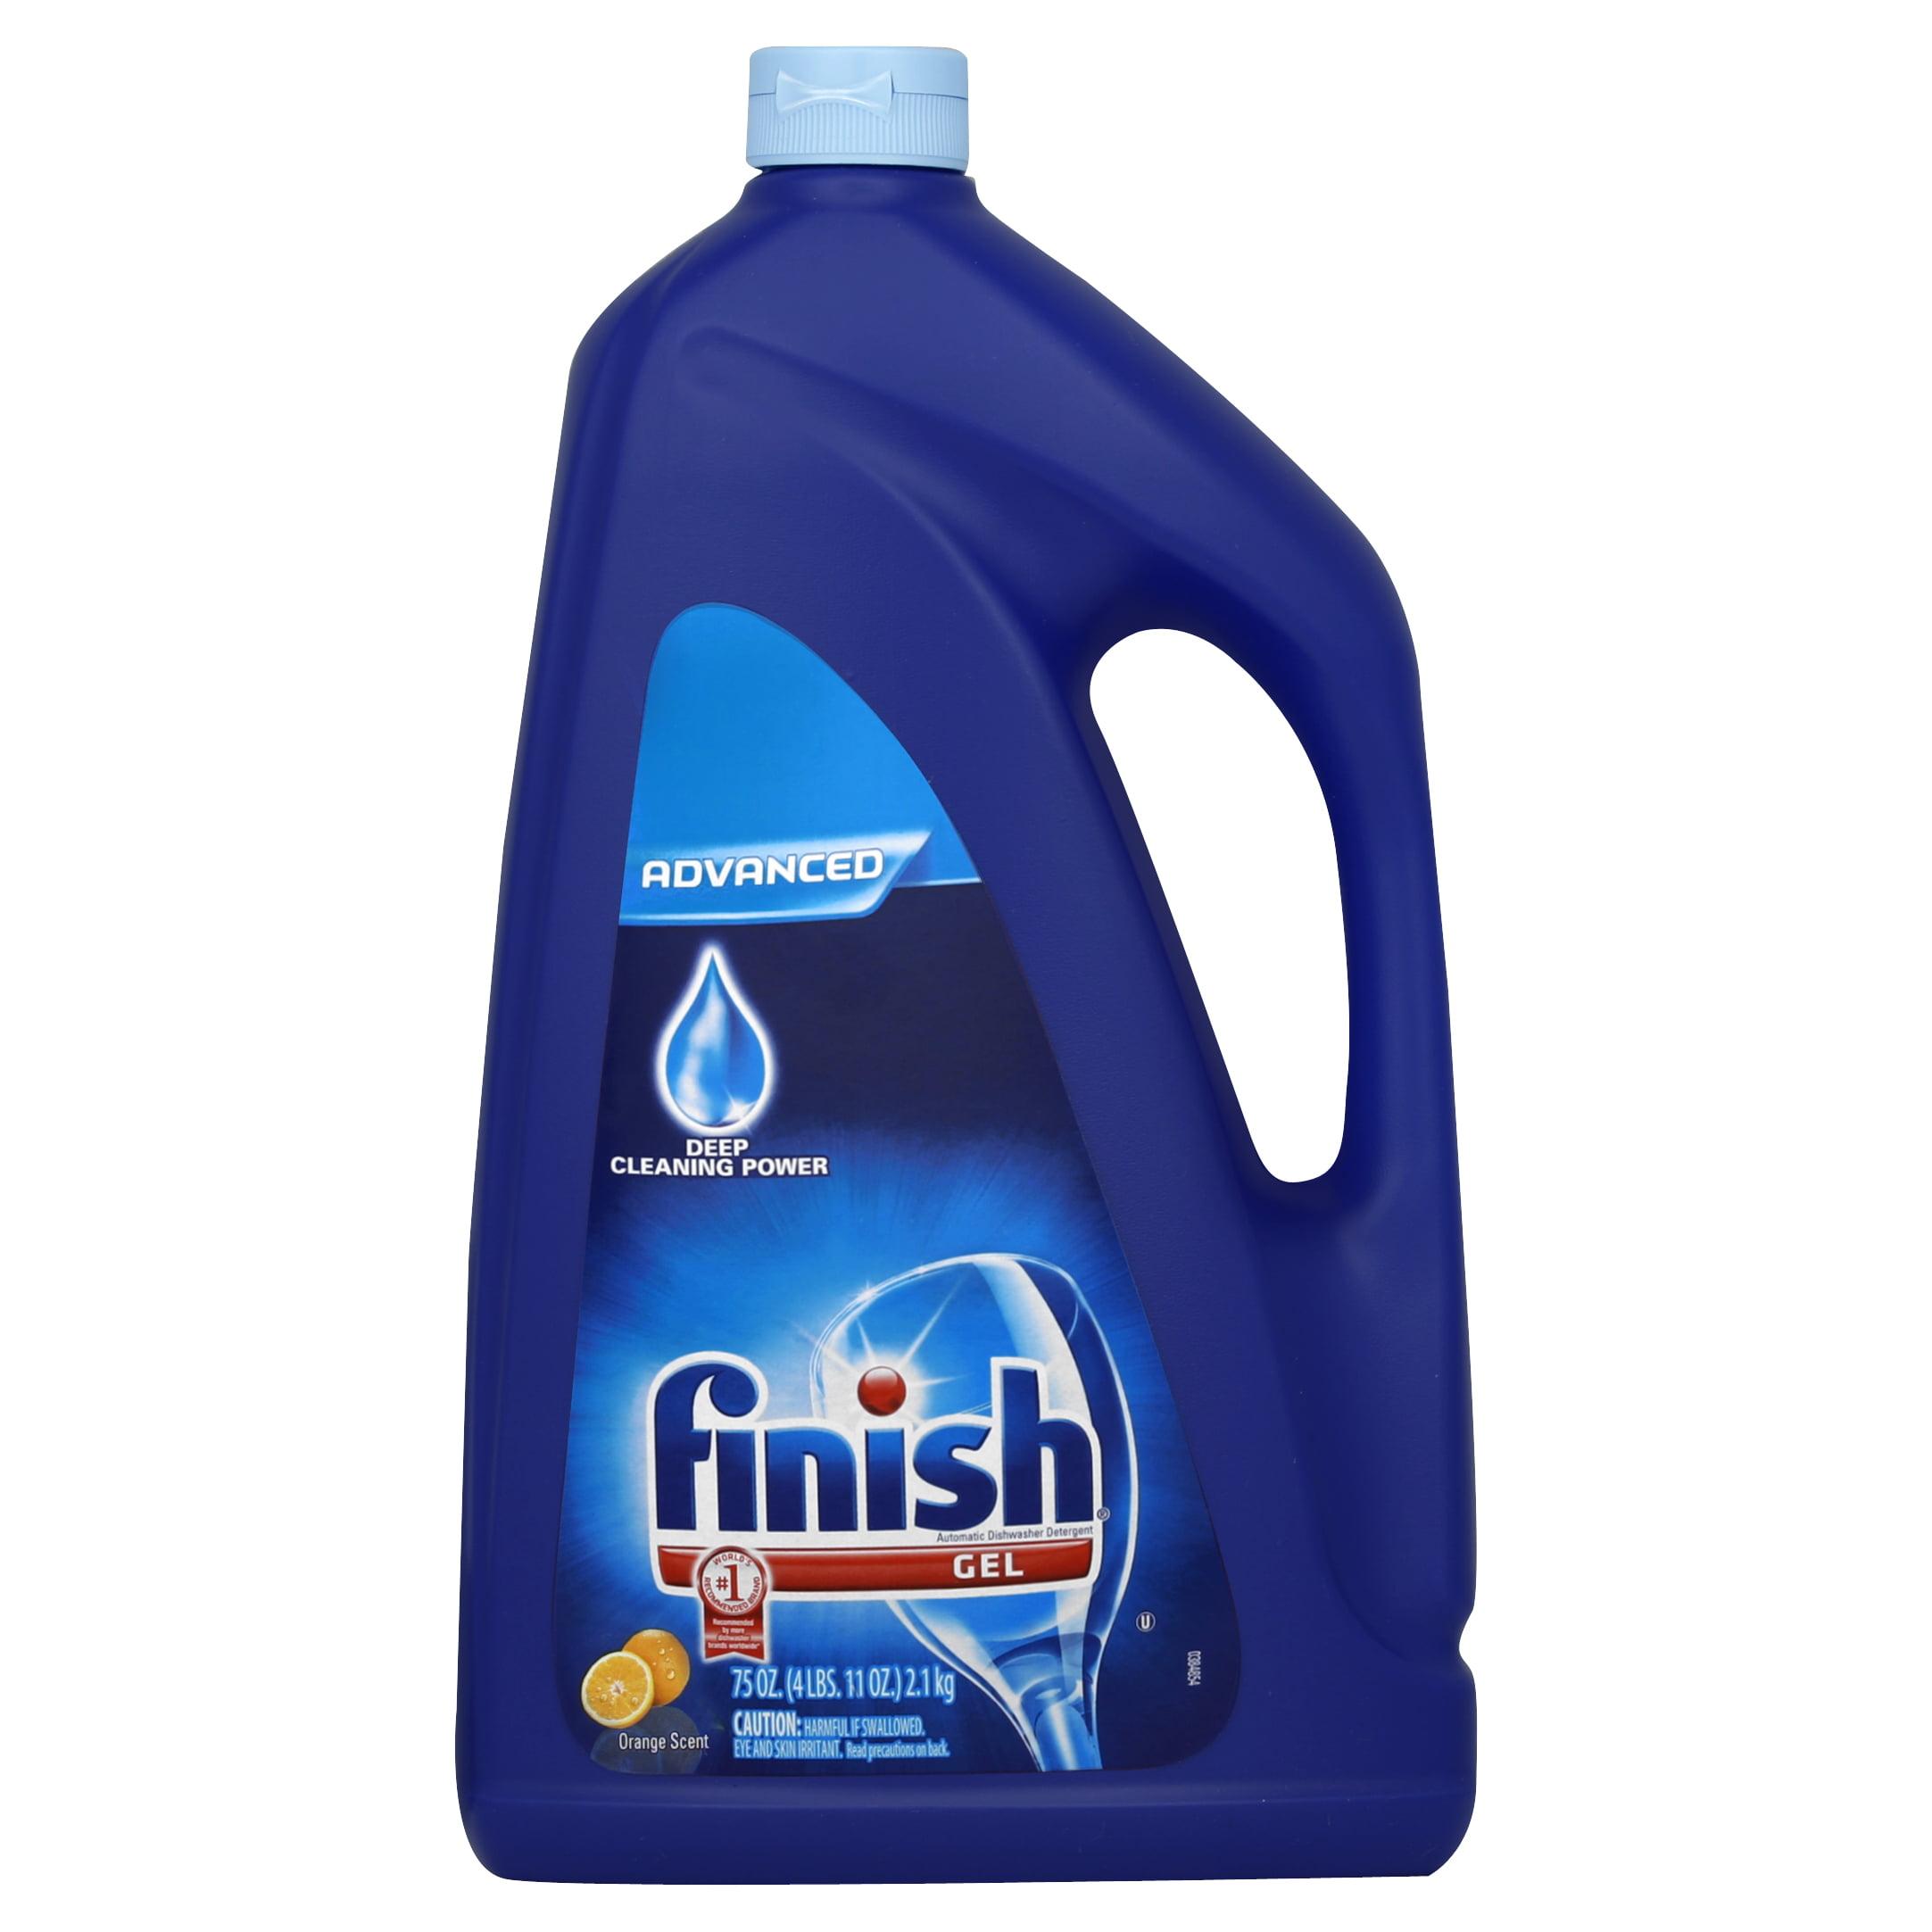 Finish Gel Dishwasher Detergent, Orange Fresh Scent, 75 Ounce